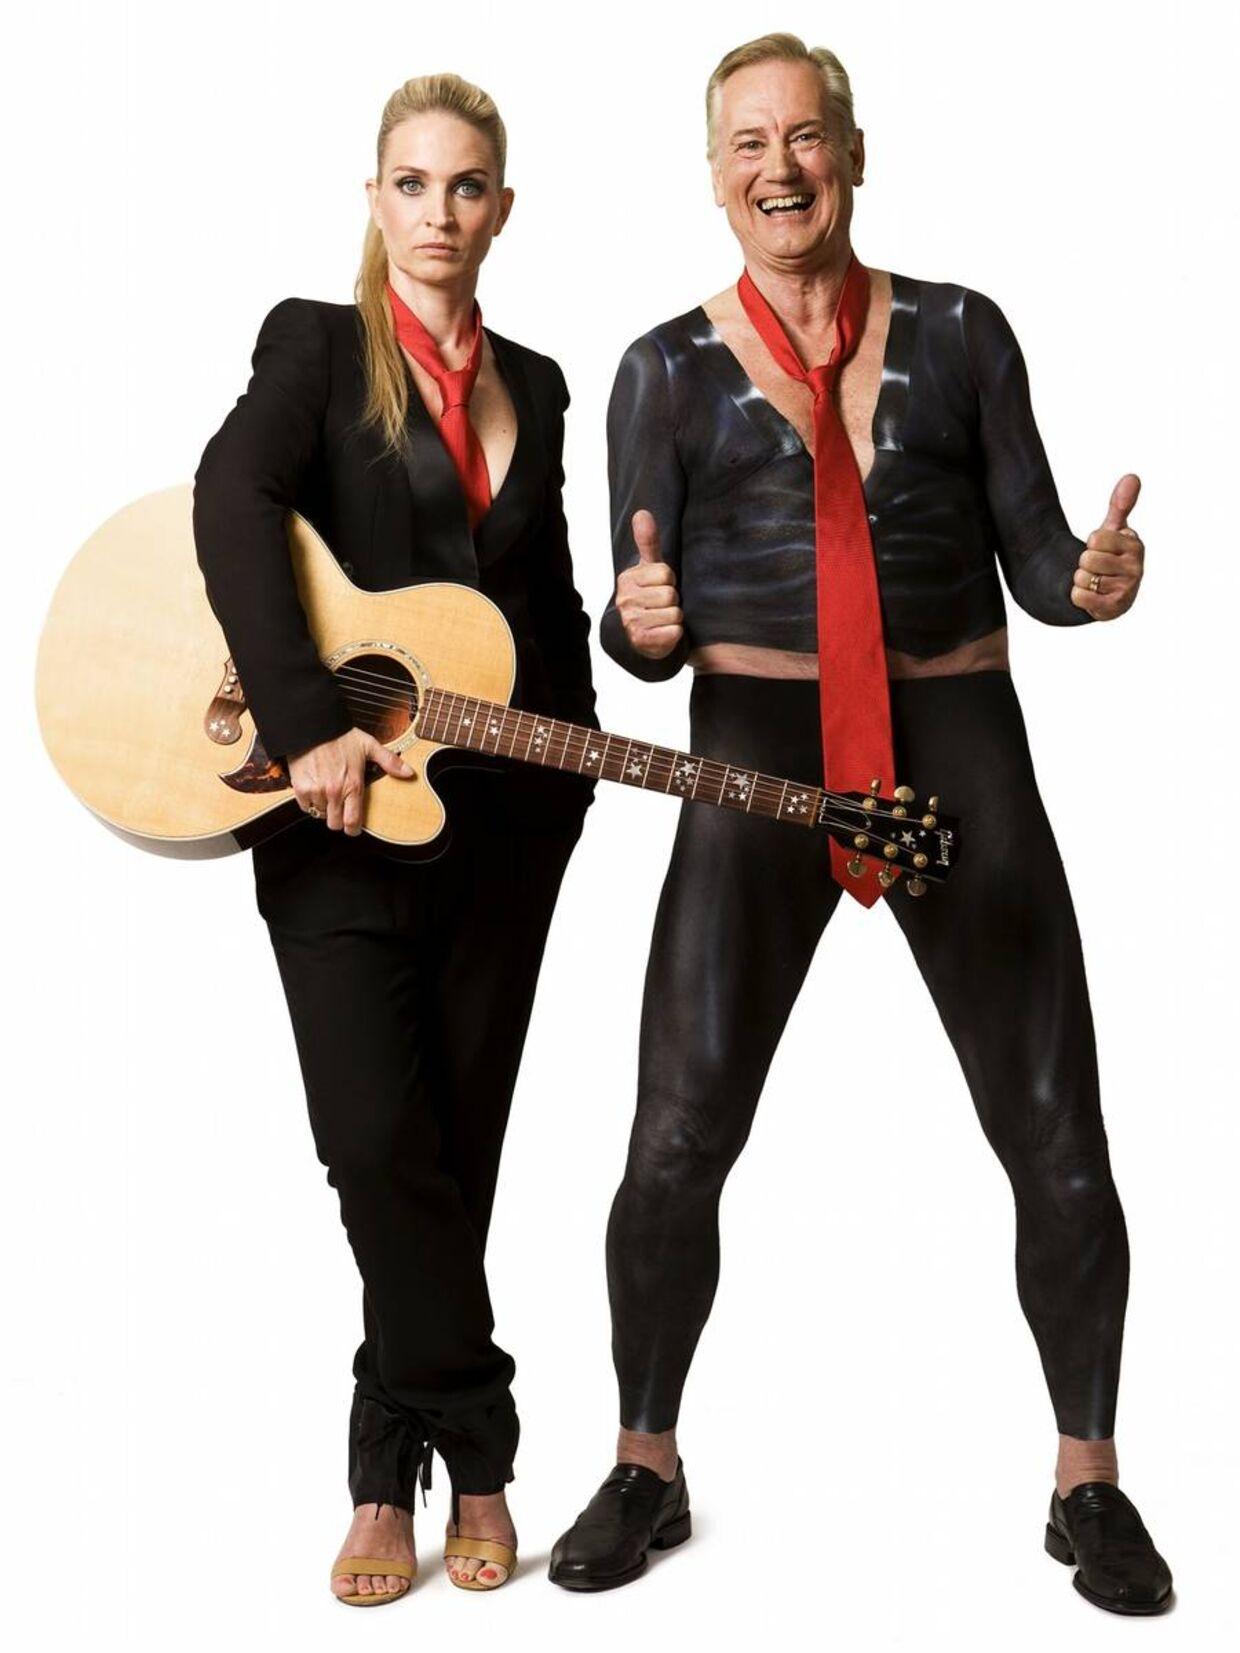 Pressefoto fra Annette og Keld Heicks fælles show fra 2013 med titlen '2 x Heick'.